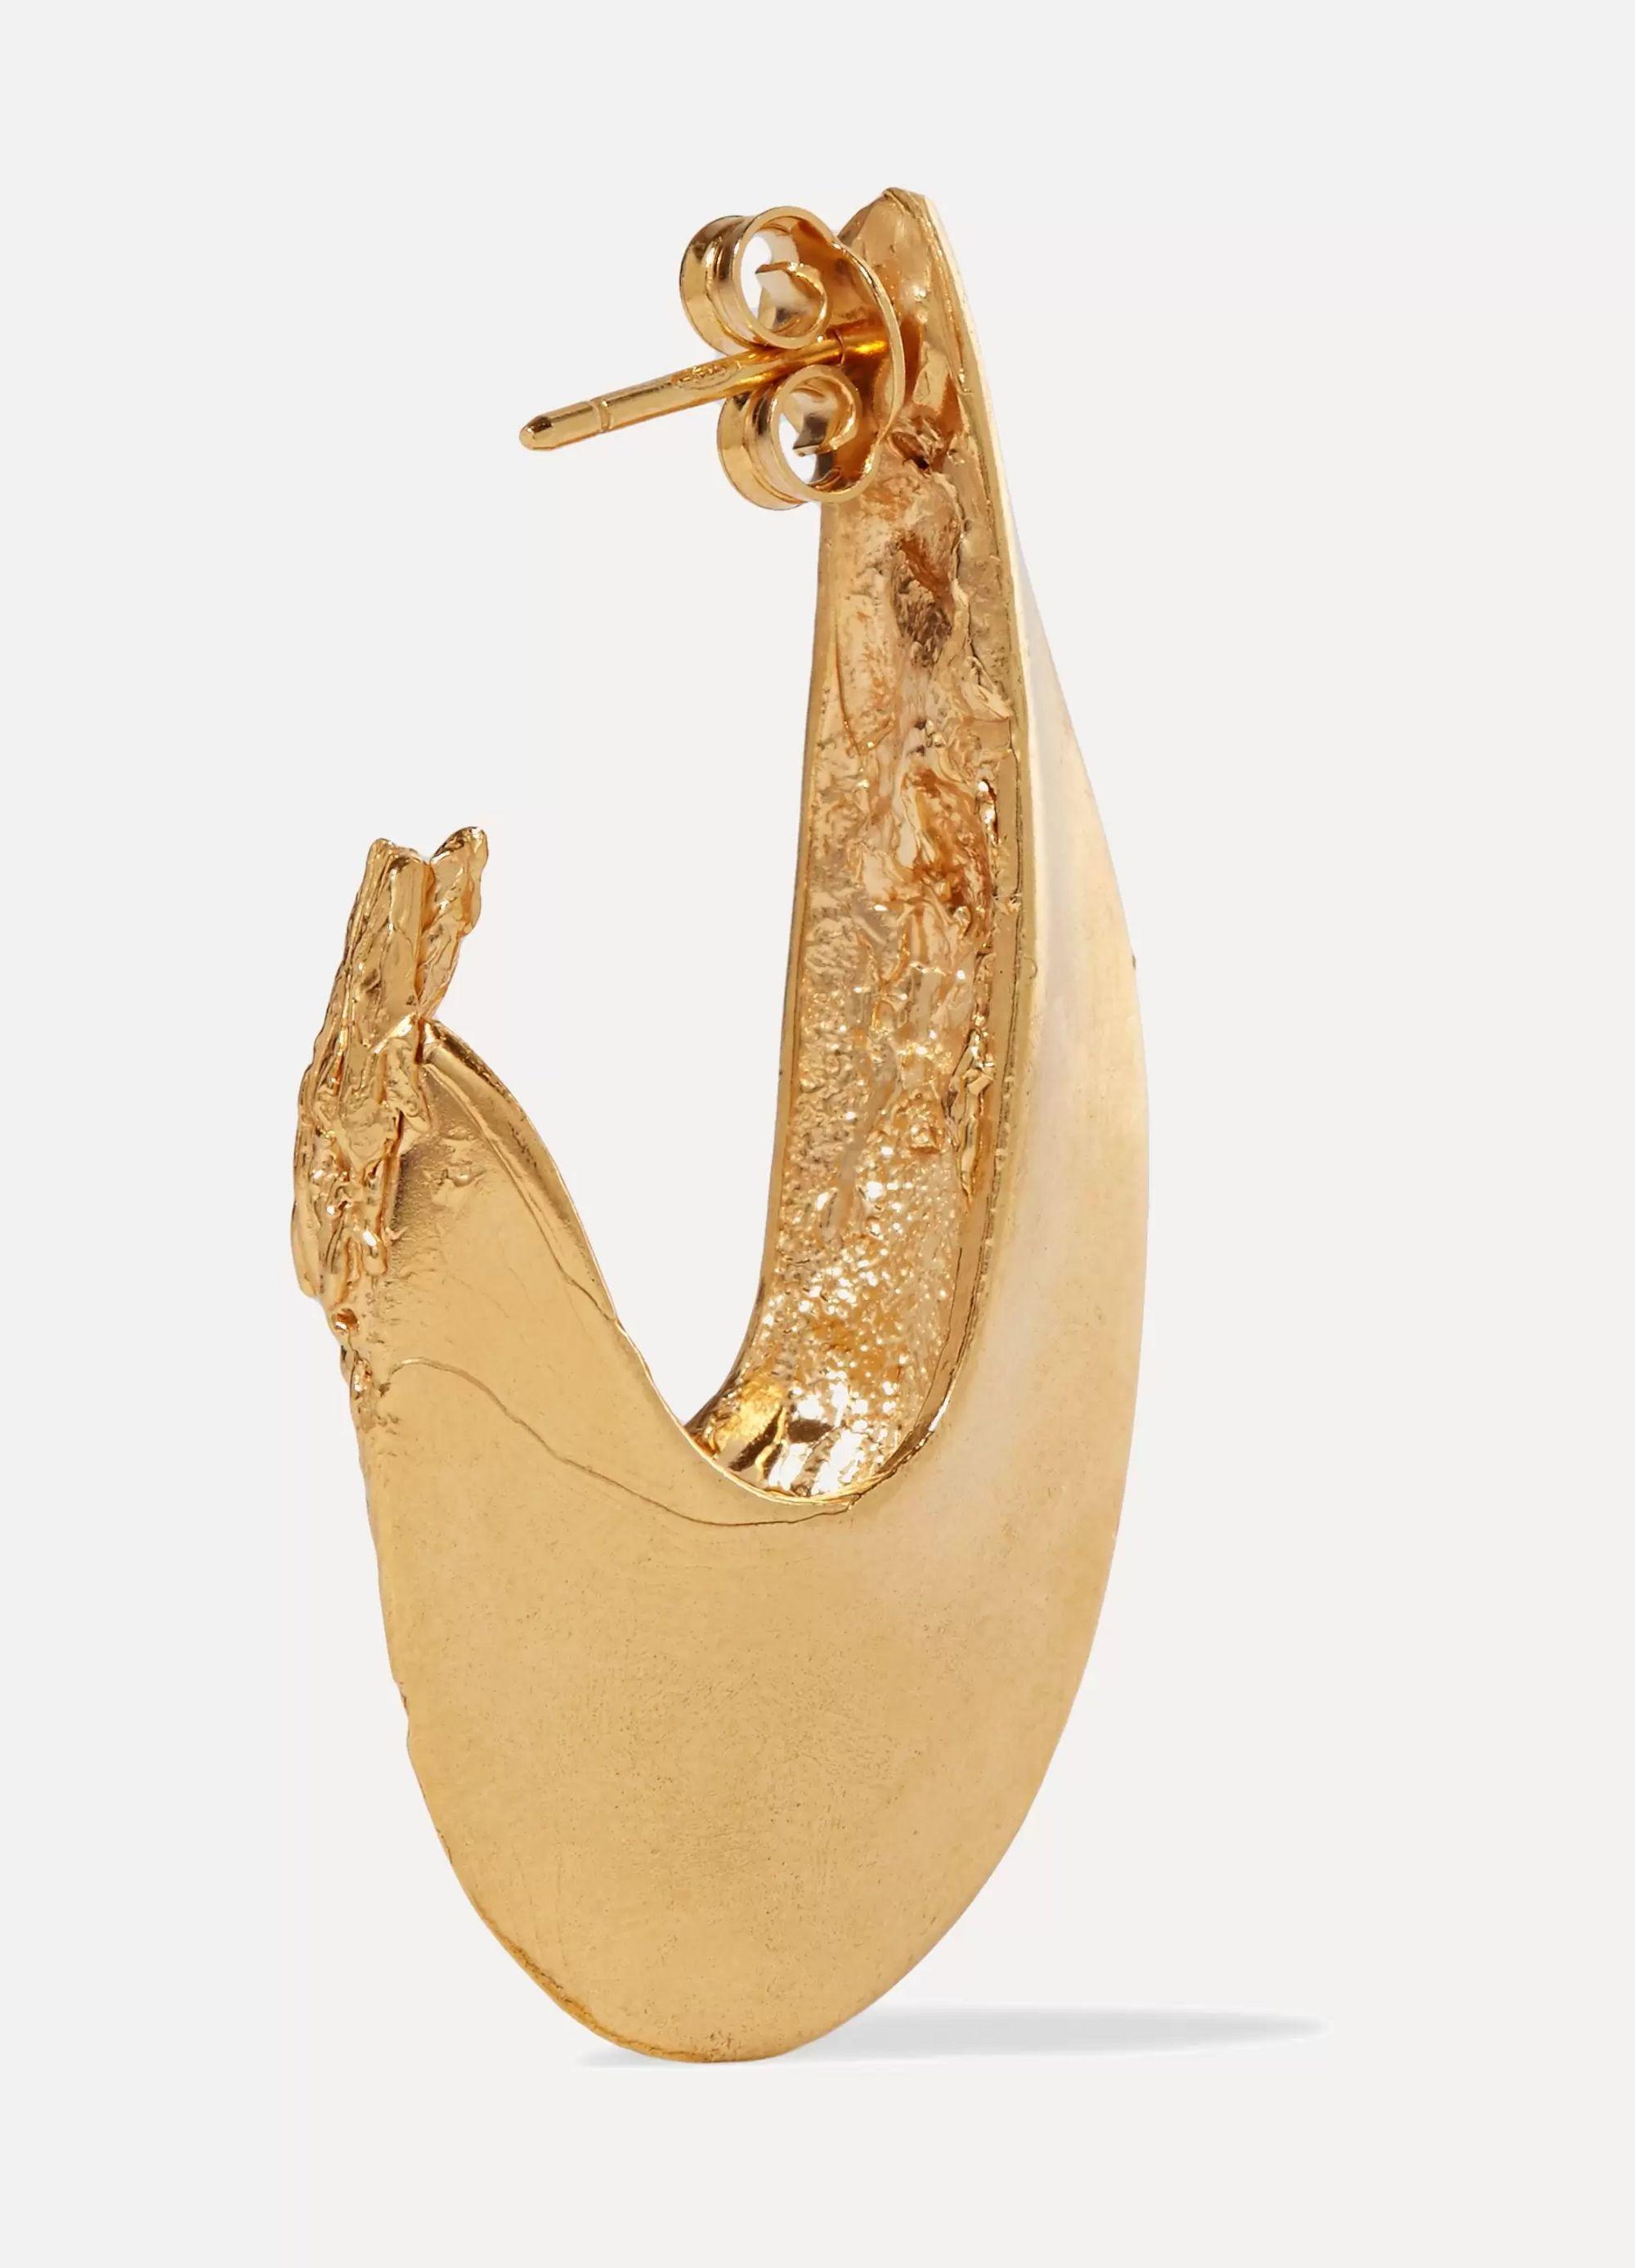 Alighieri Il Leone 2.0 gold-plated hoop earrings